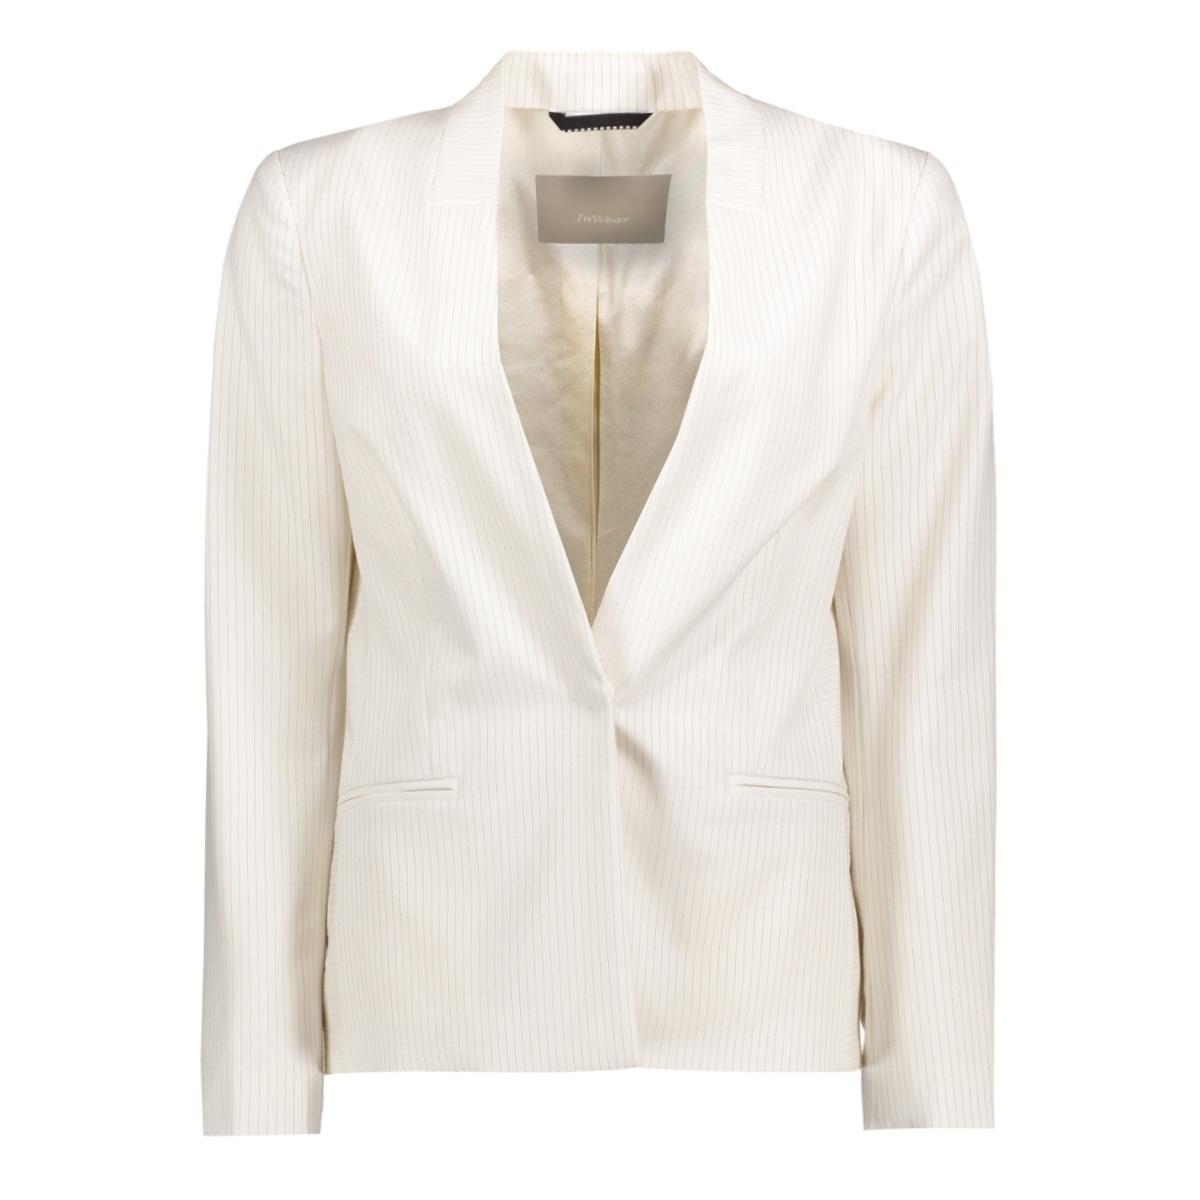 30101795 inwear blazer 10051 white smoke